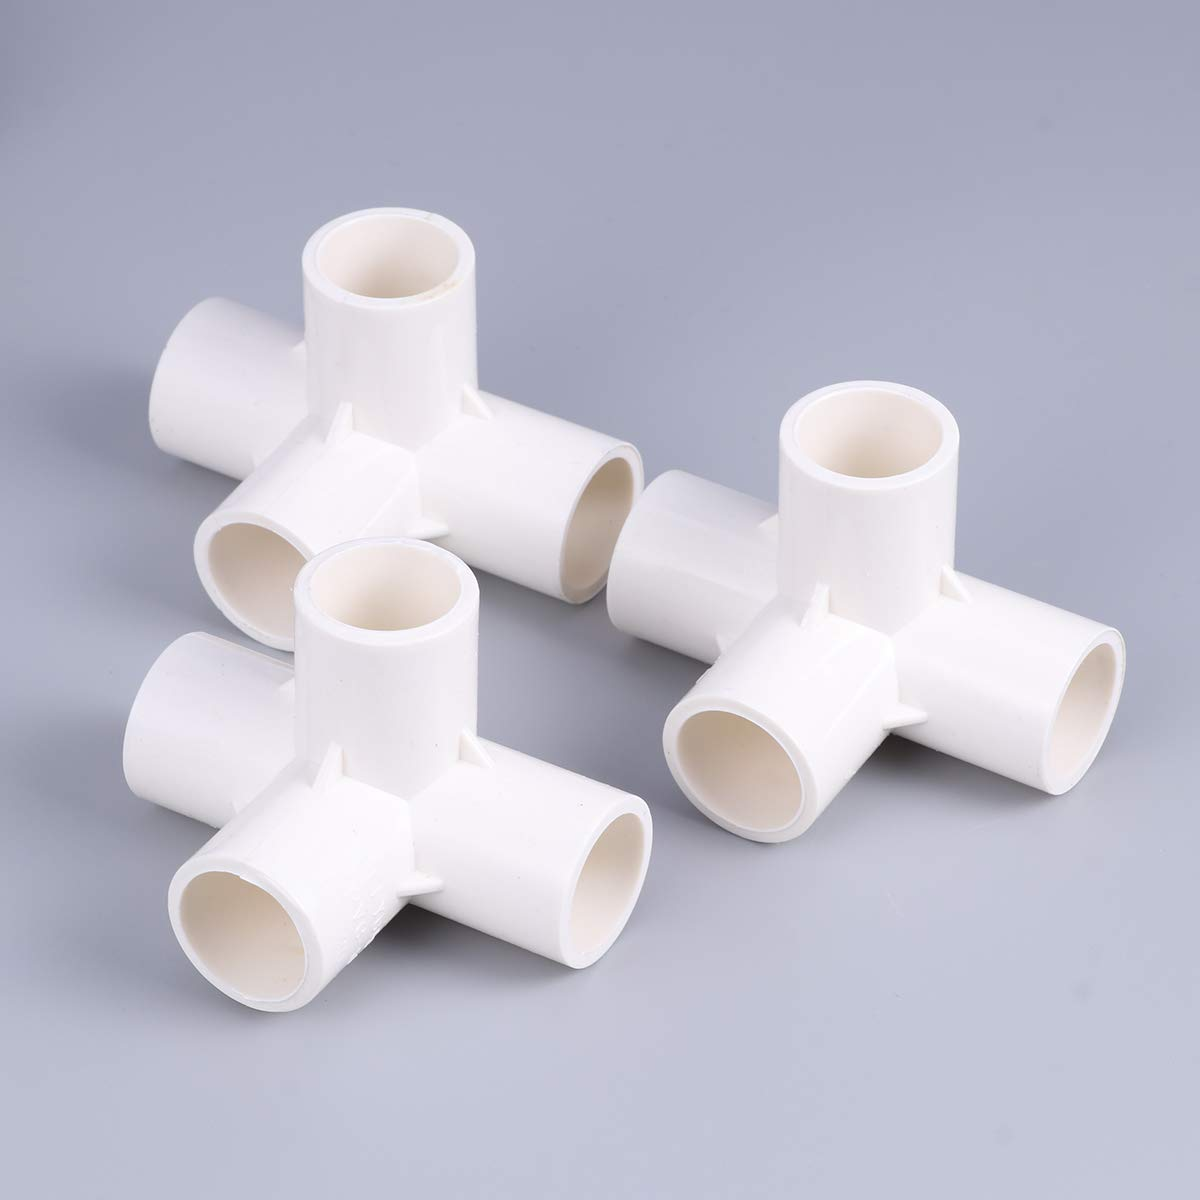 Blanco Yardwe 10PCS Conector de adaptador de tubo de tuber/ía de agua de conexi/ón de PVC de 4 v/ías